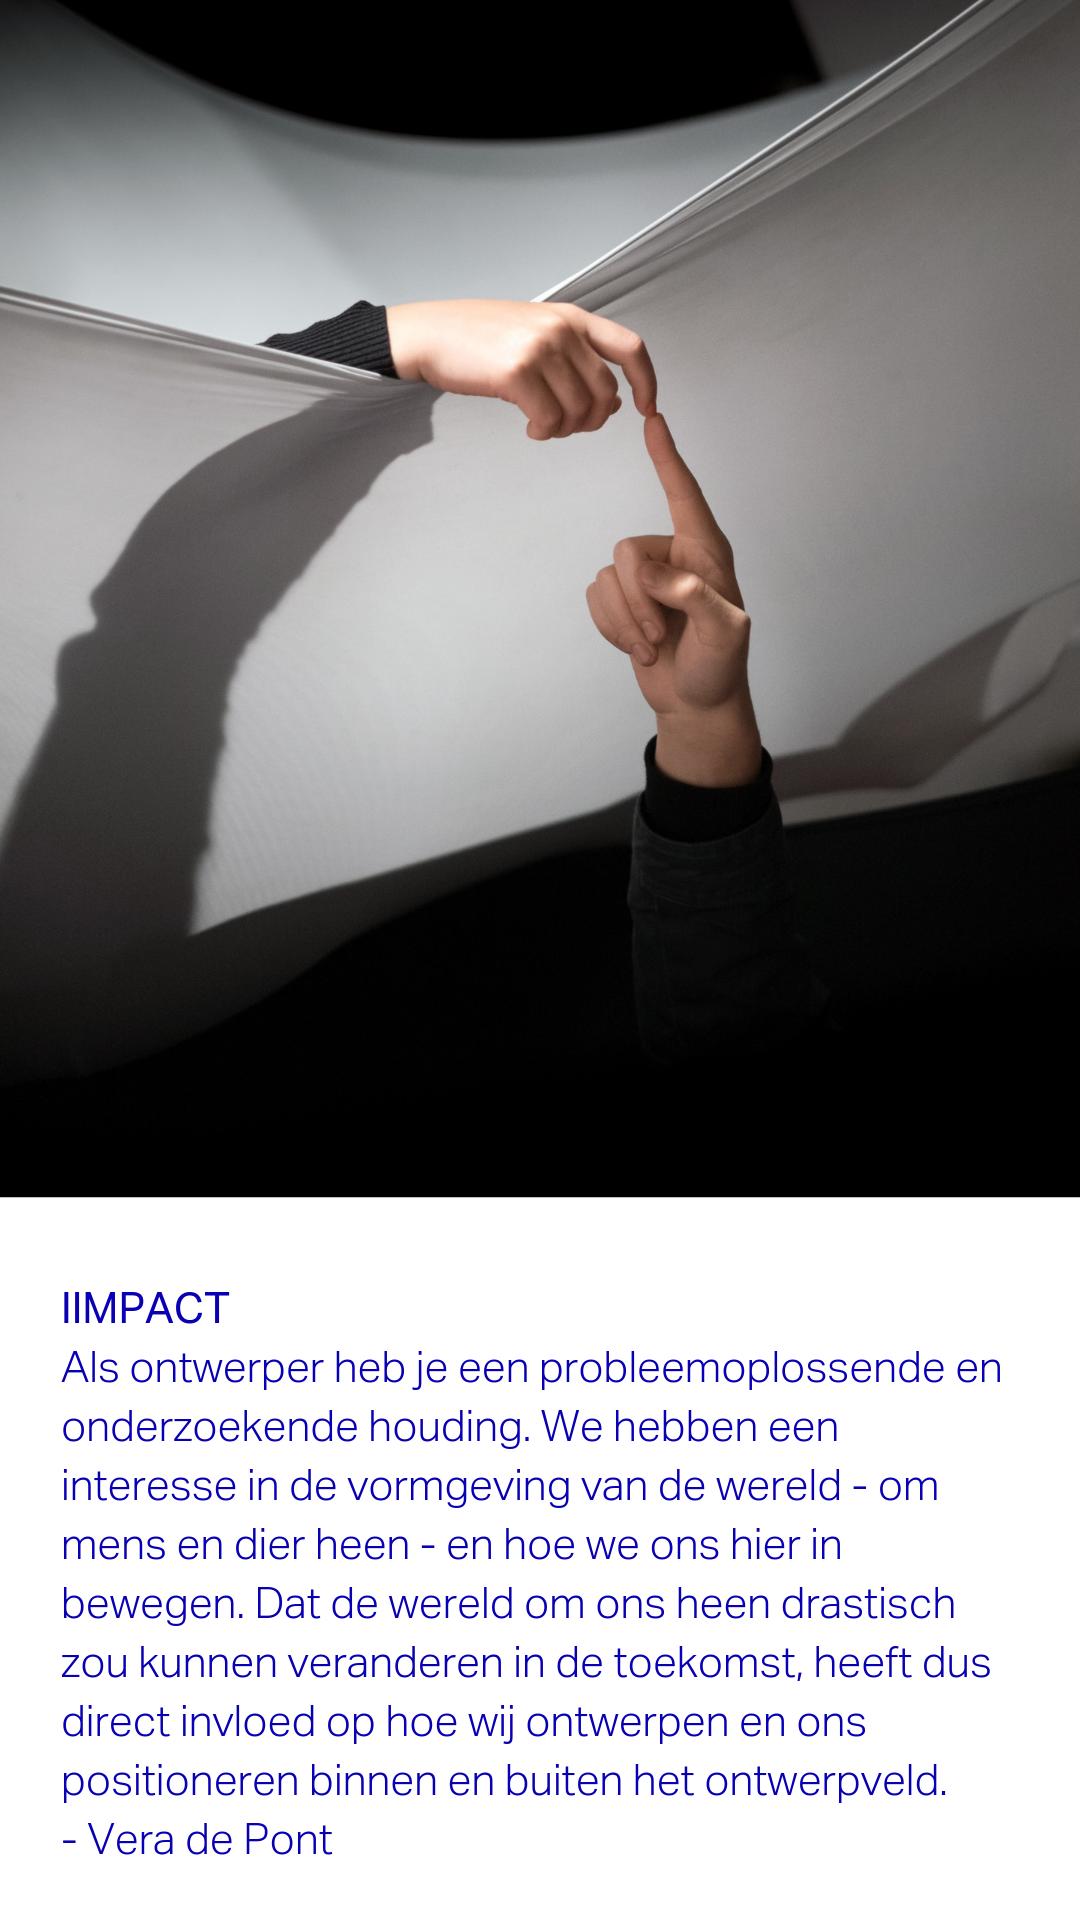 Taskforce-Fashion-Fashion-After-Flood-kennismaking-maastricht-Vera-de-Pont-2.png